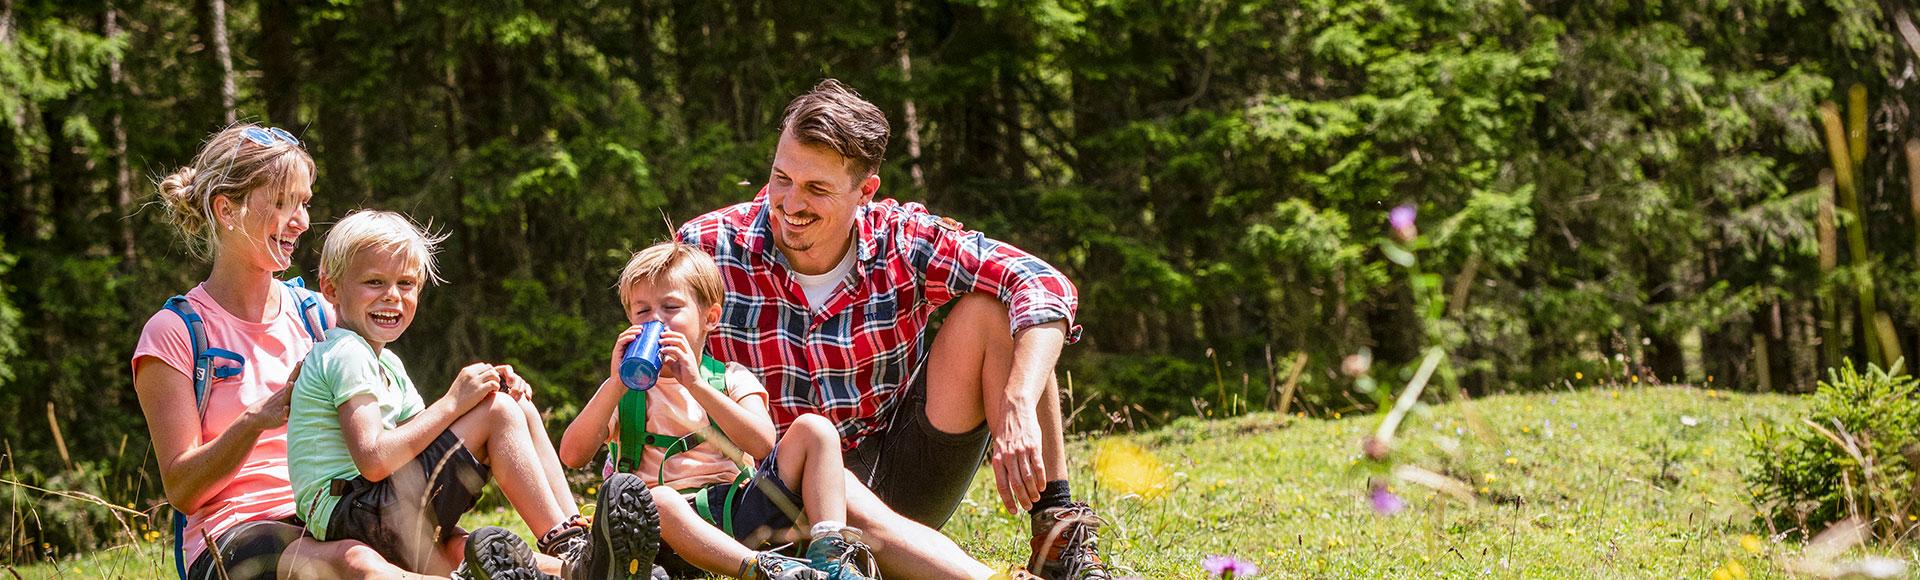 Sommerurlaub Familienurlaub Flachau Salzburg 1